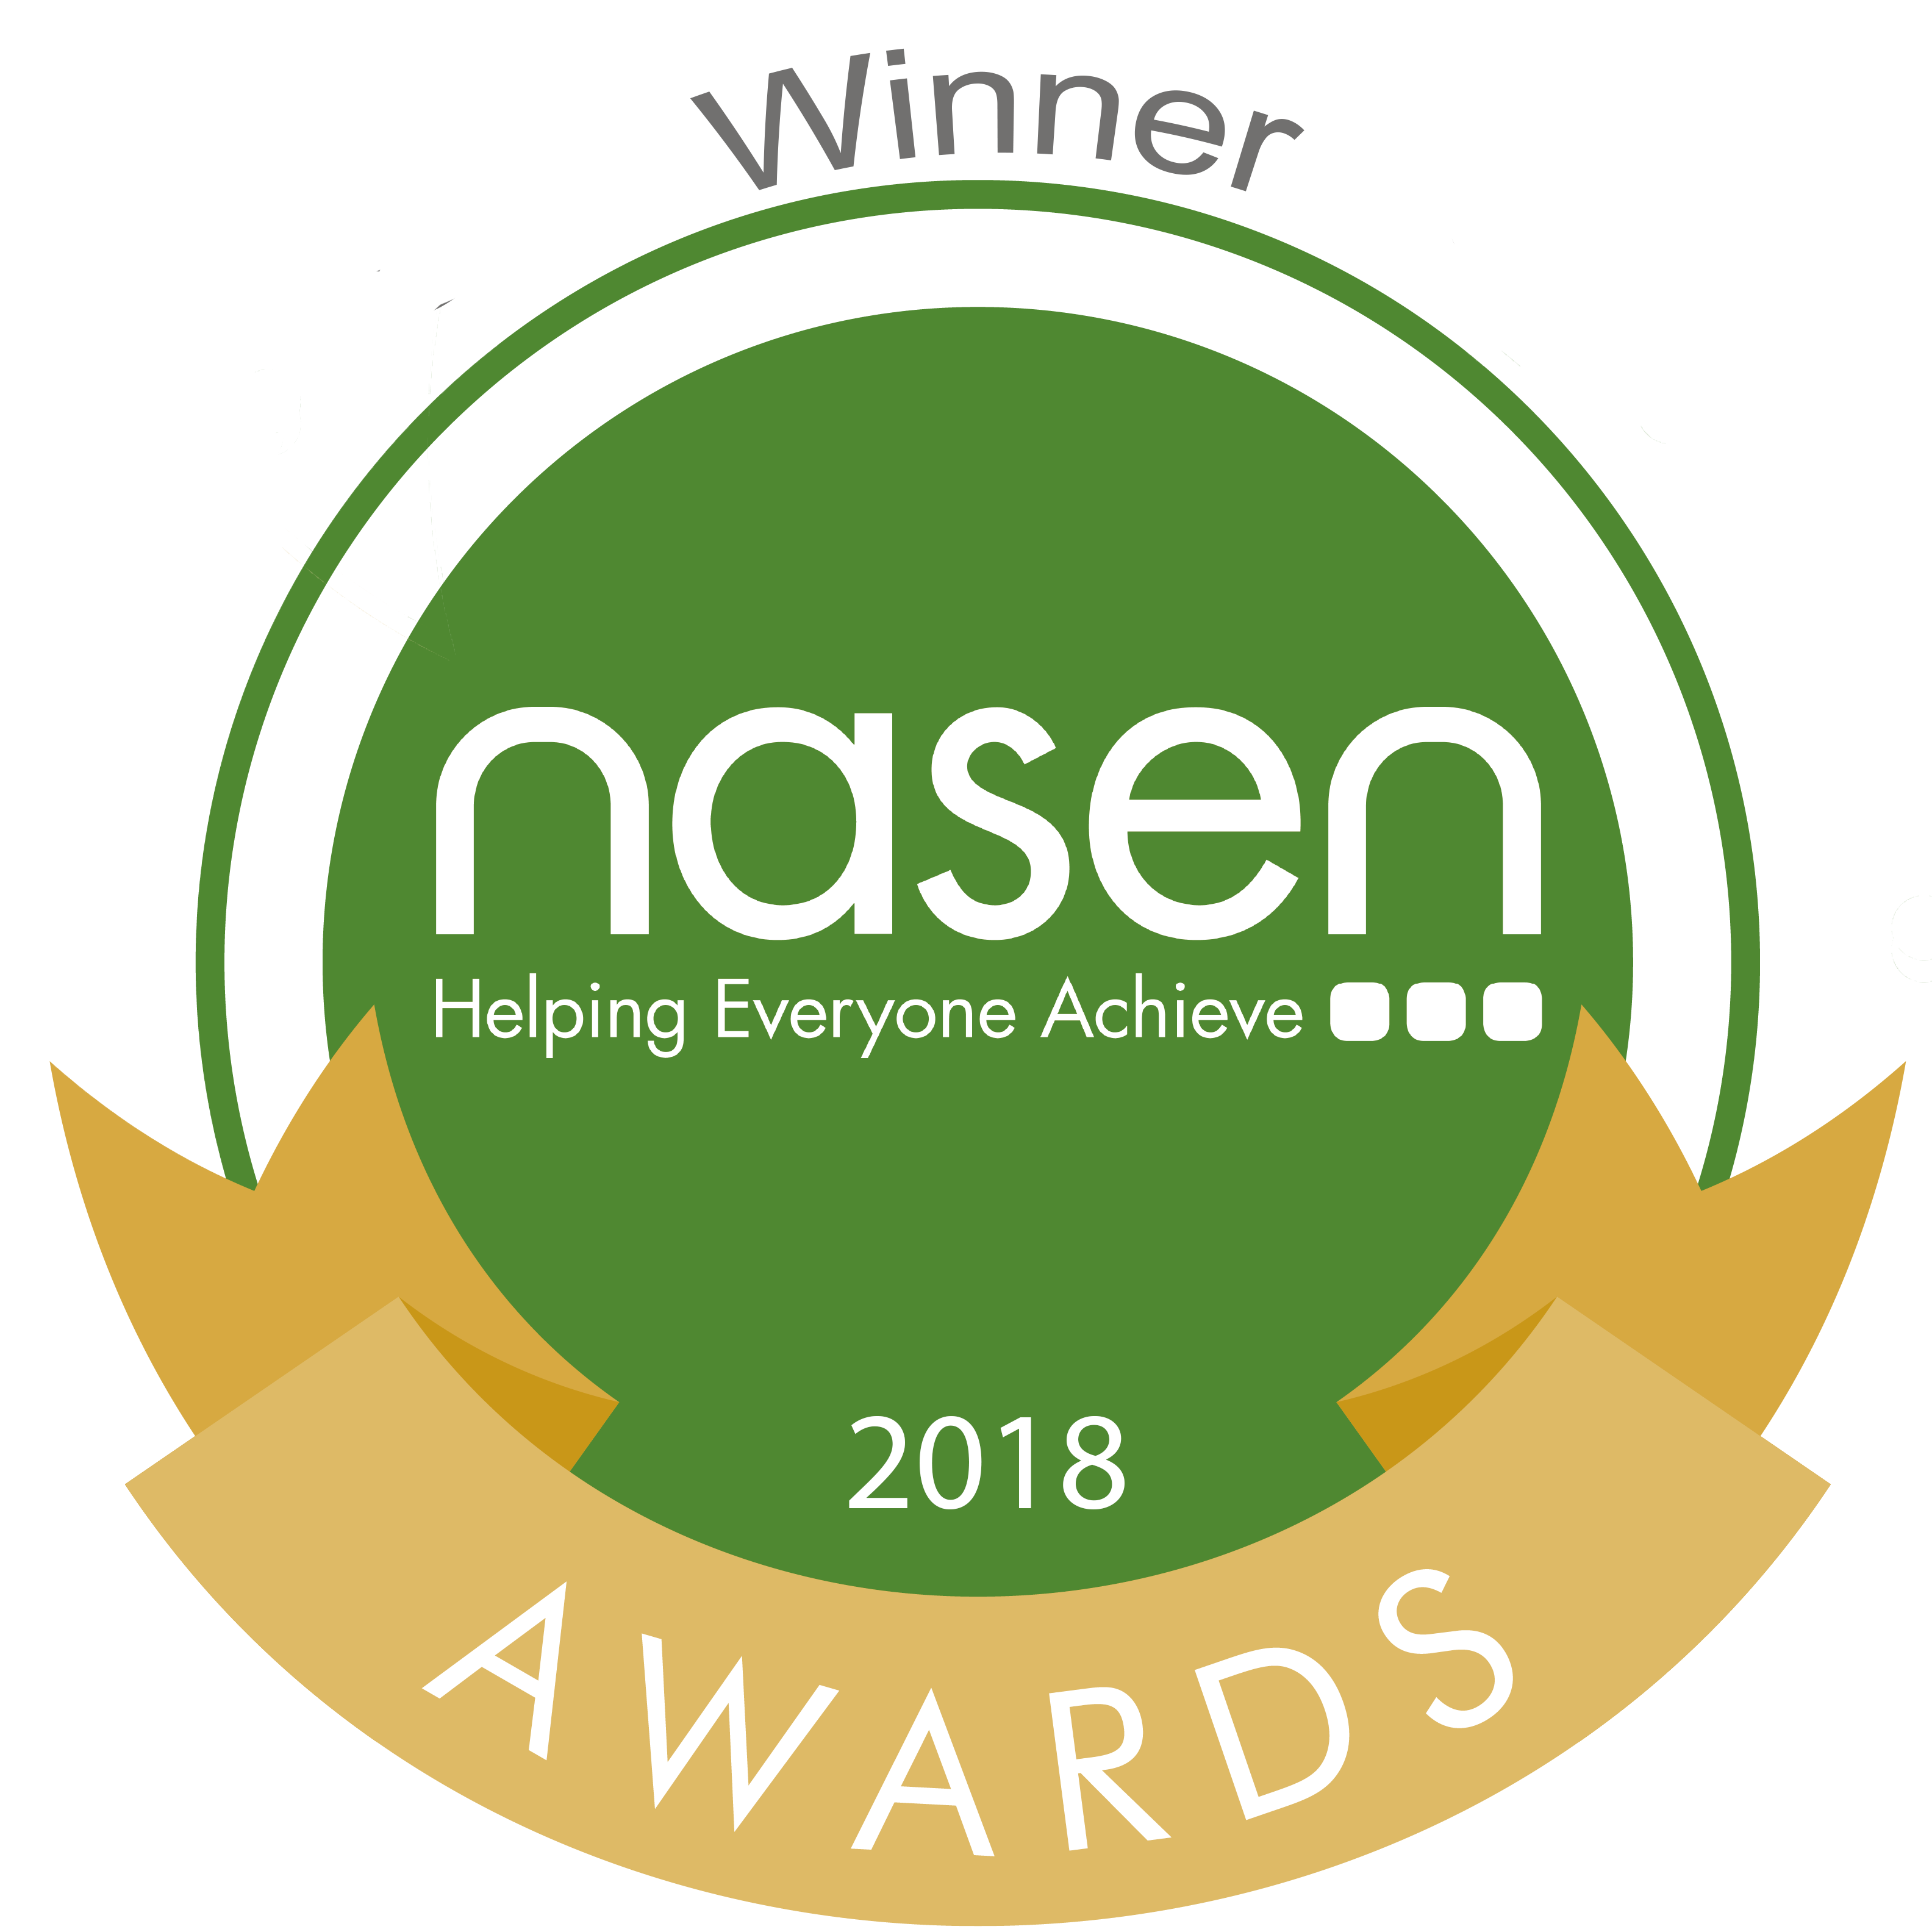 IDL Literacy Wins National SEND Award